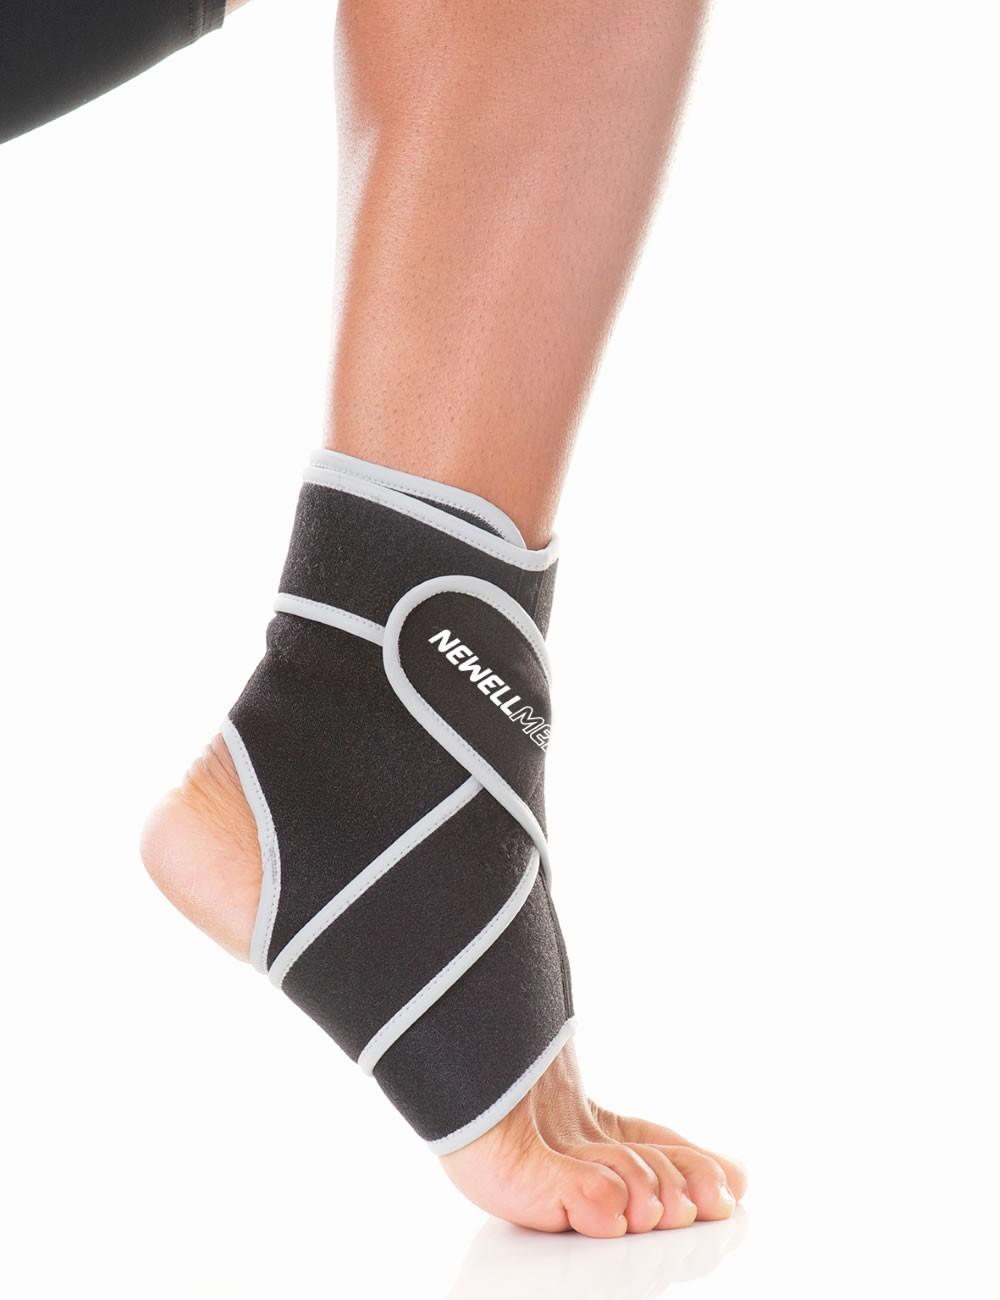 PK64 - Eight-shaped ankle brace